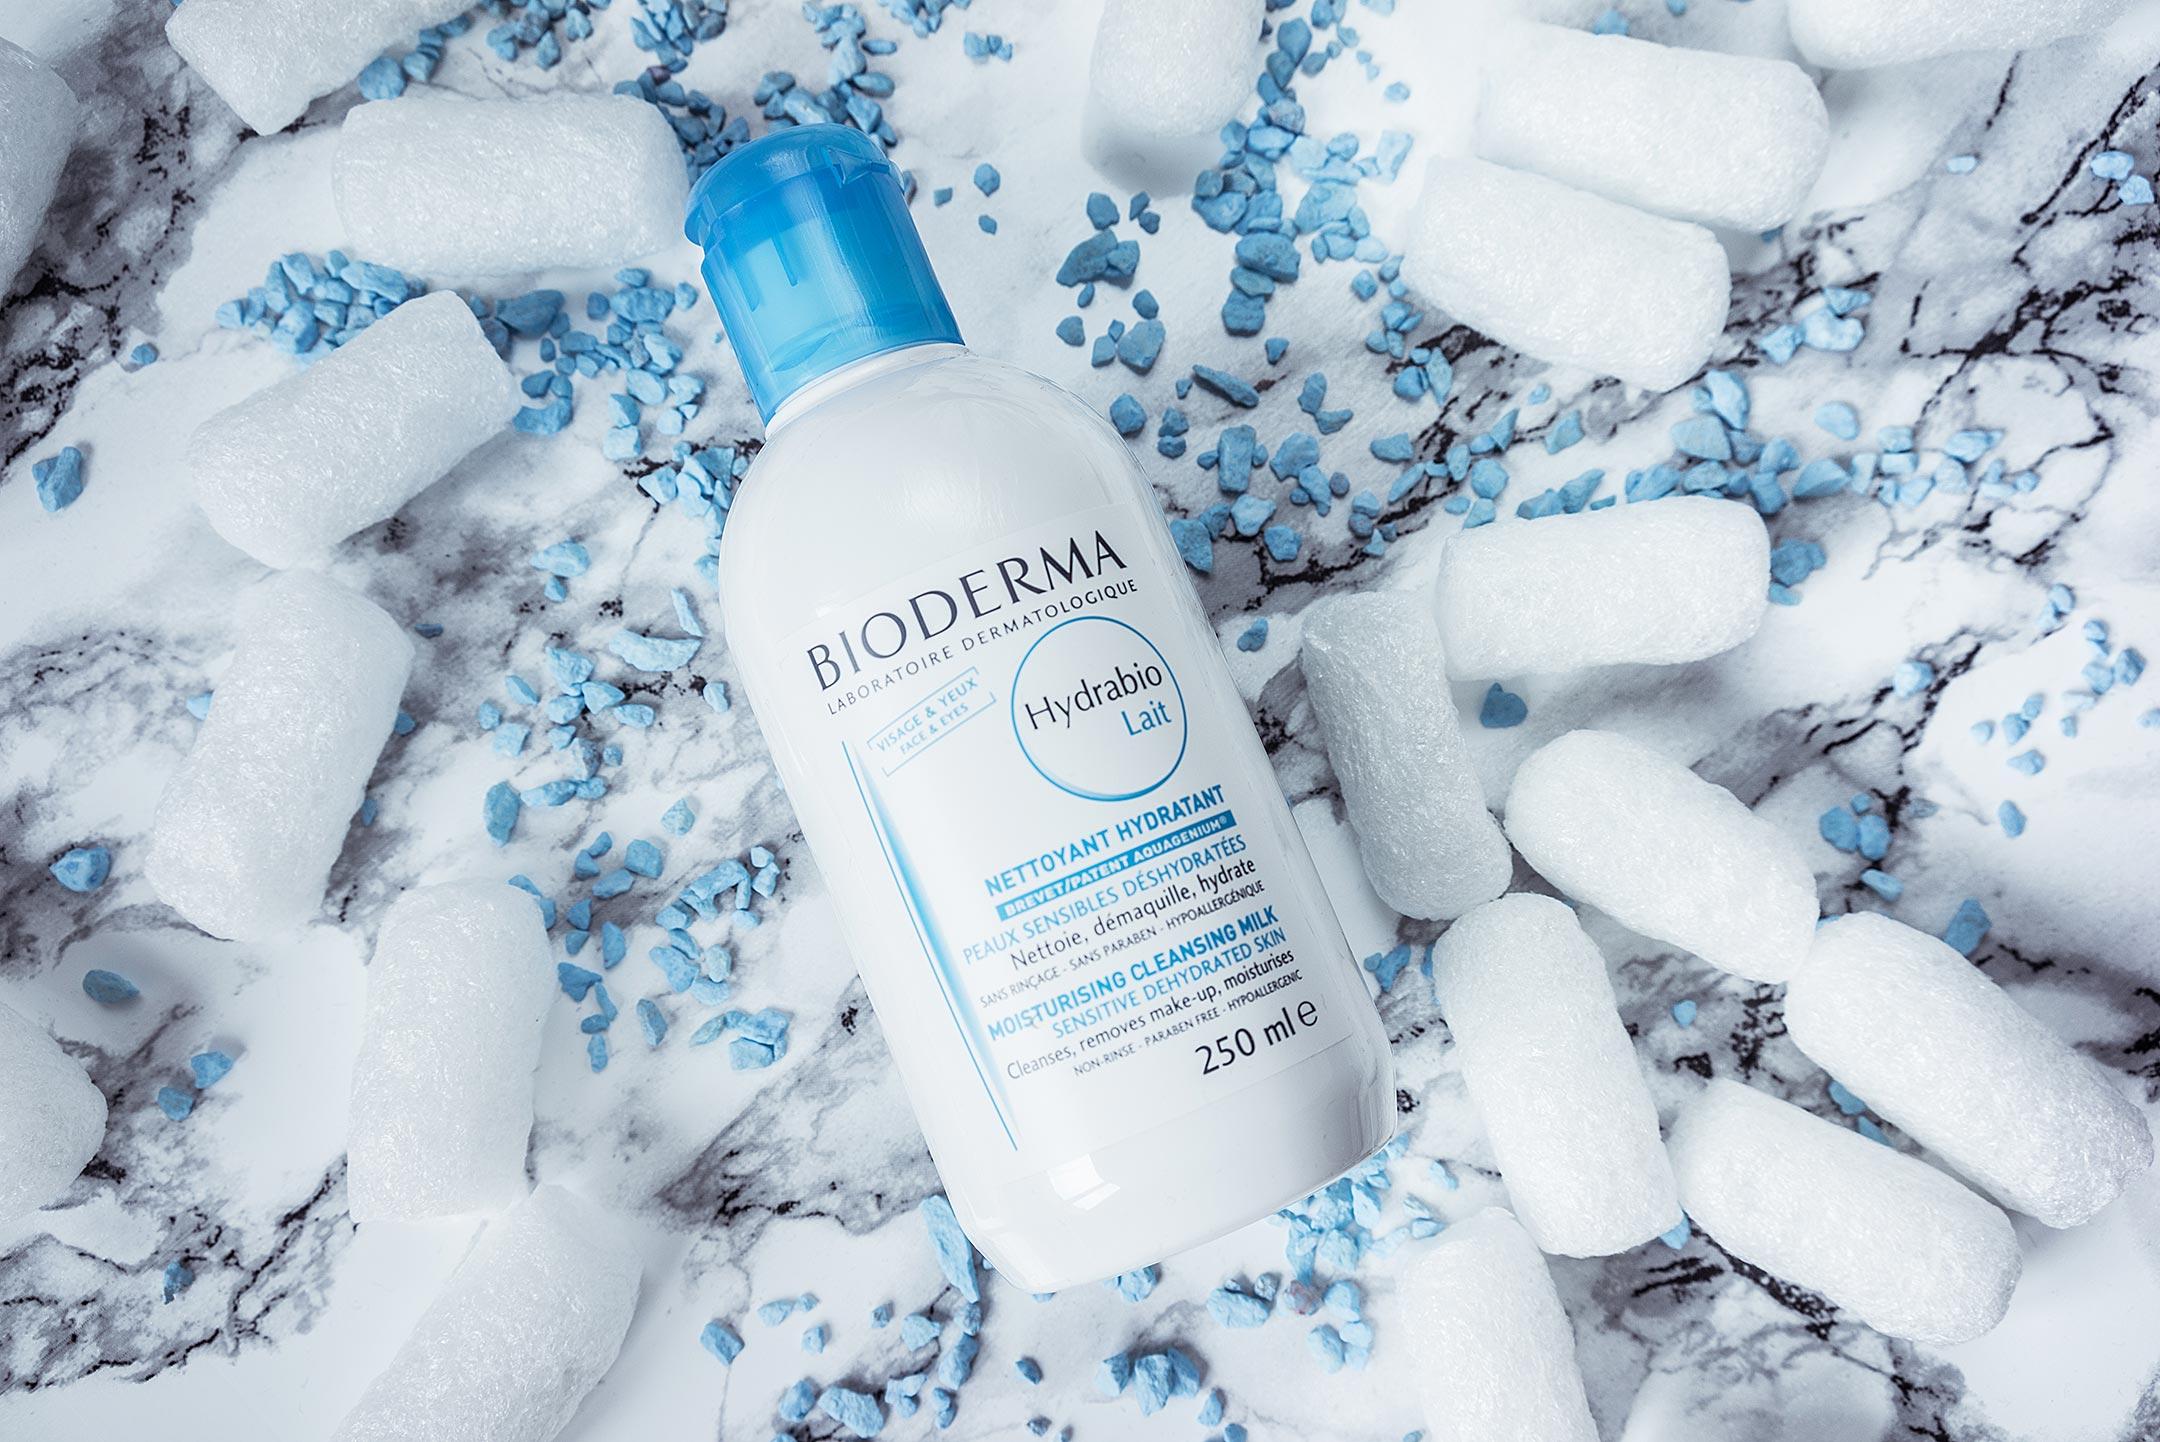 Bioderma Hydrabio Lait Reinigungsmilch Beautyblog Sunnyinga